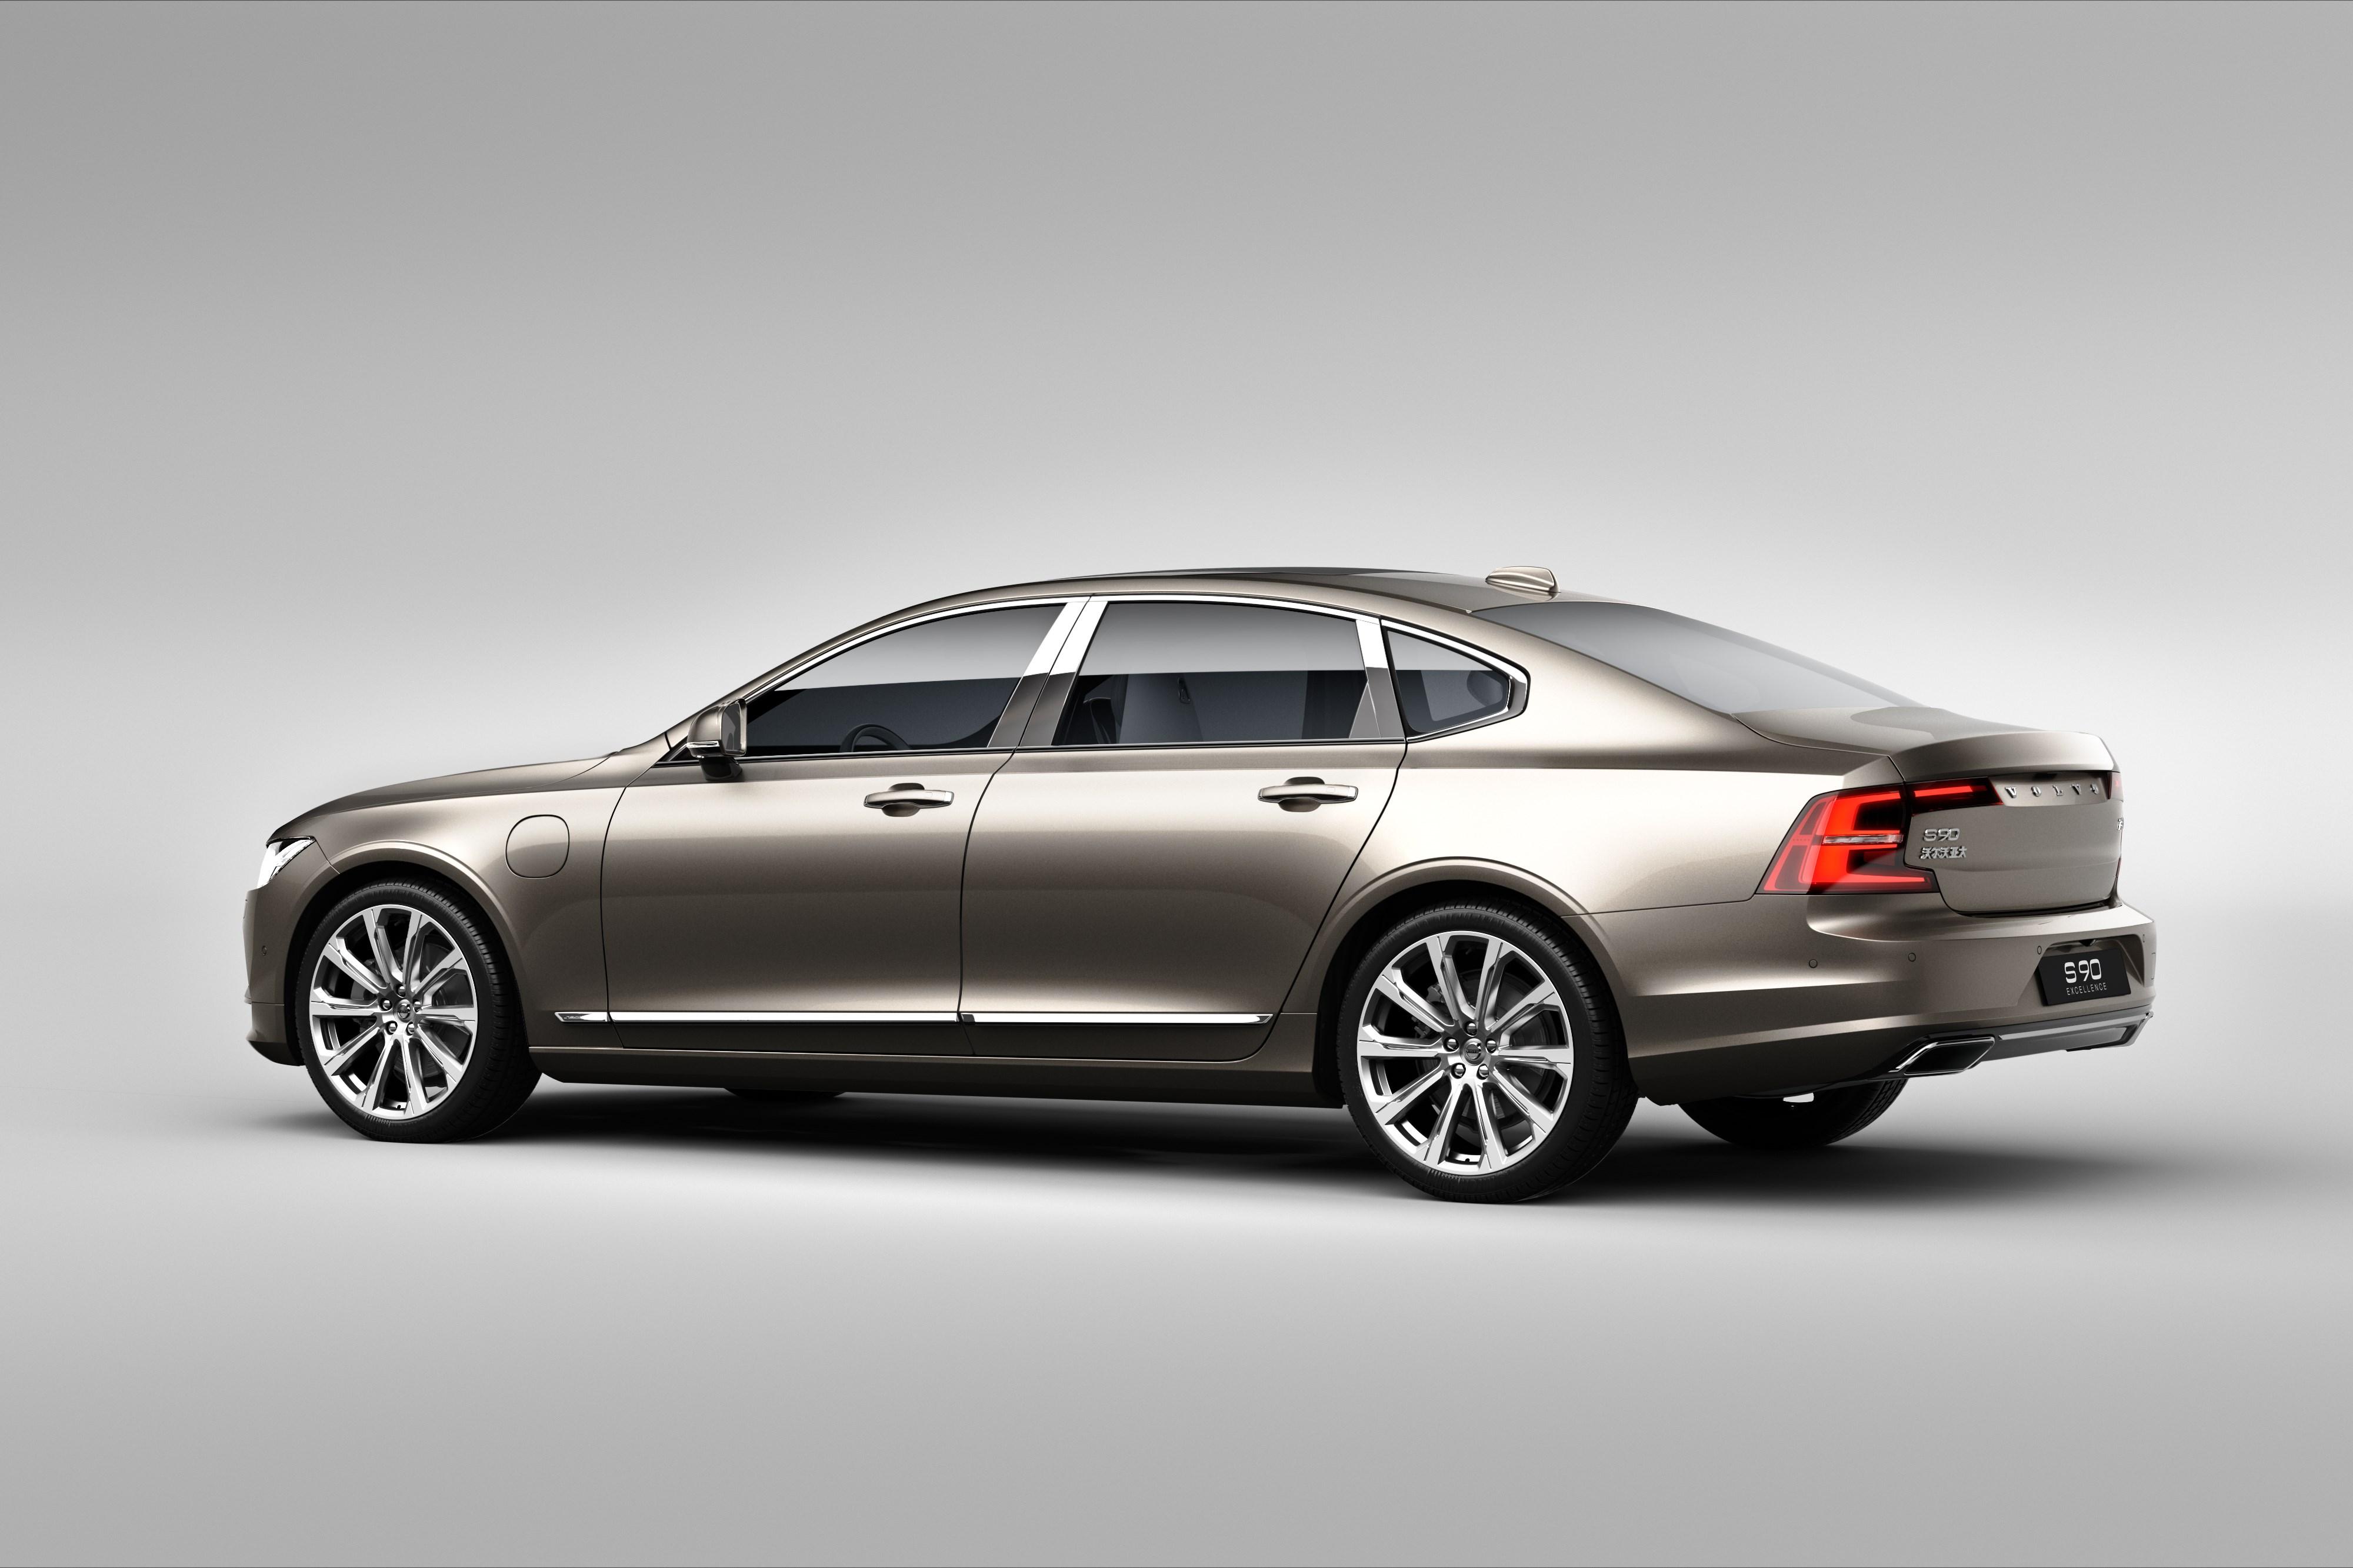 199966_Volvo_S90_Excellence_exterior_rear_3_4.jpg